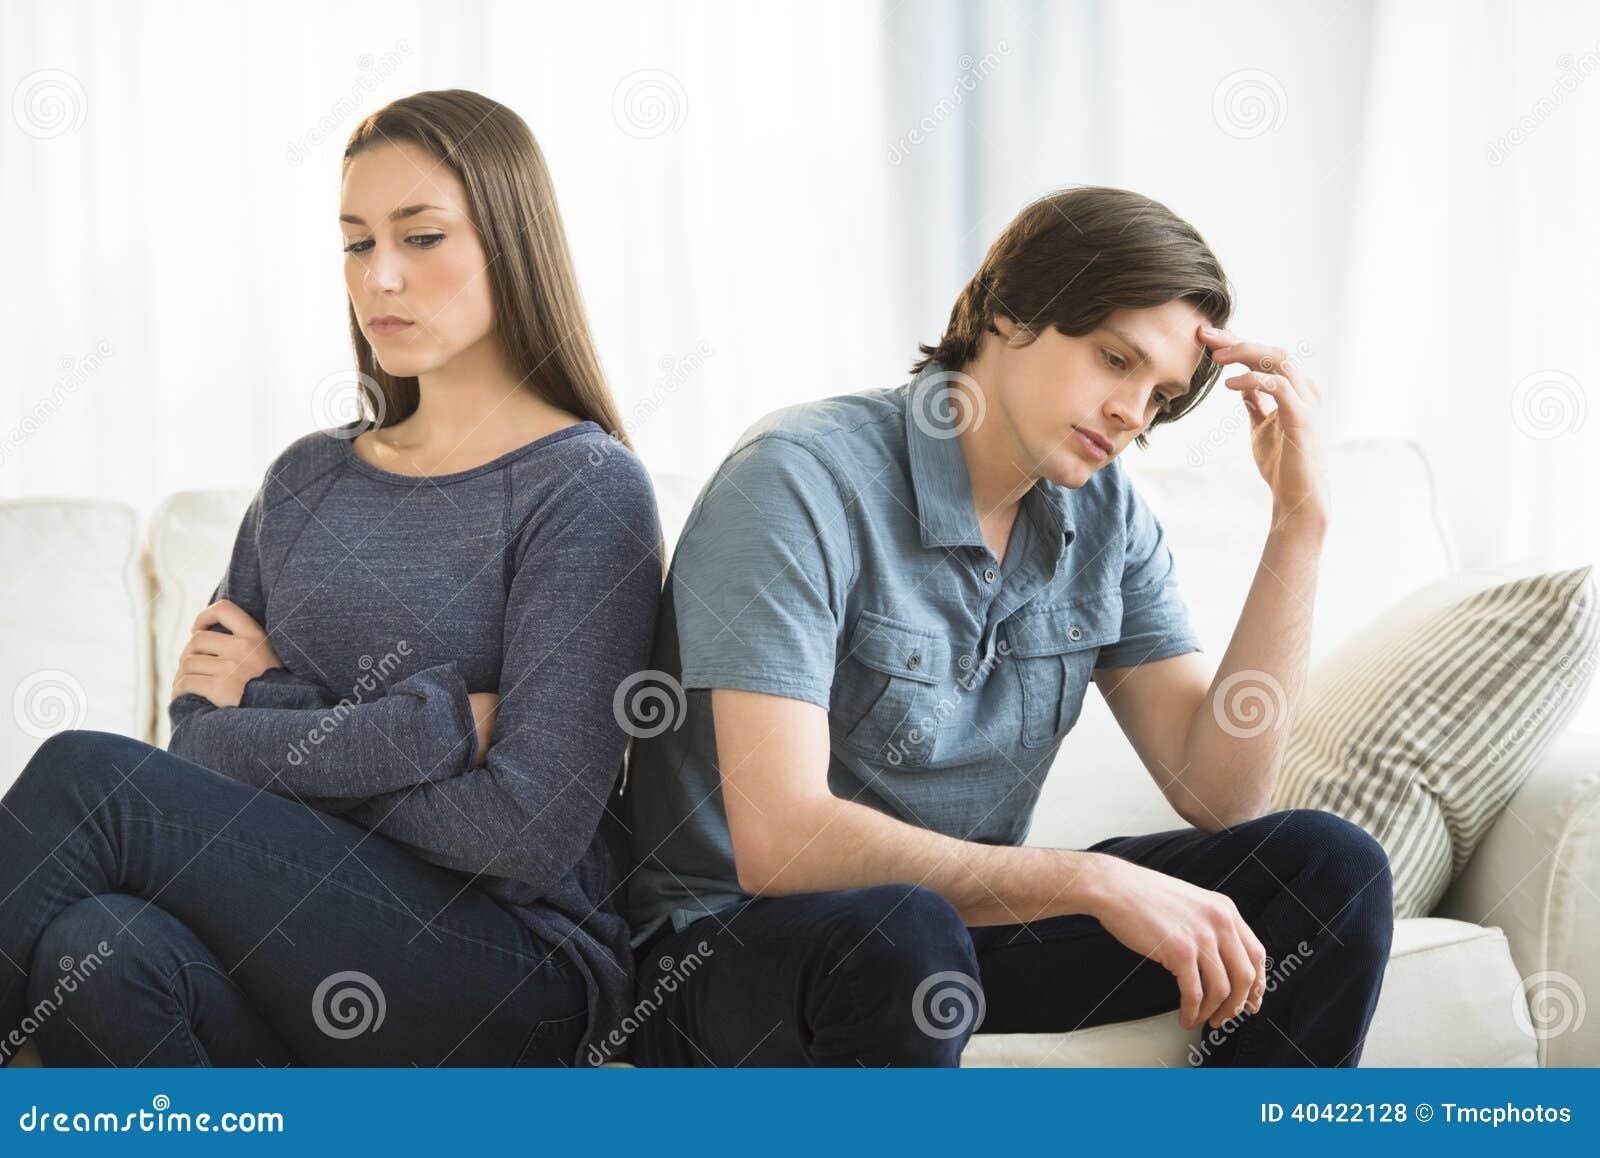 Couple Ignoring Each Other On Sofa Stock Photo - Image: 40422128